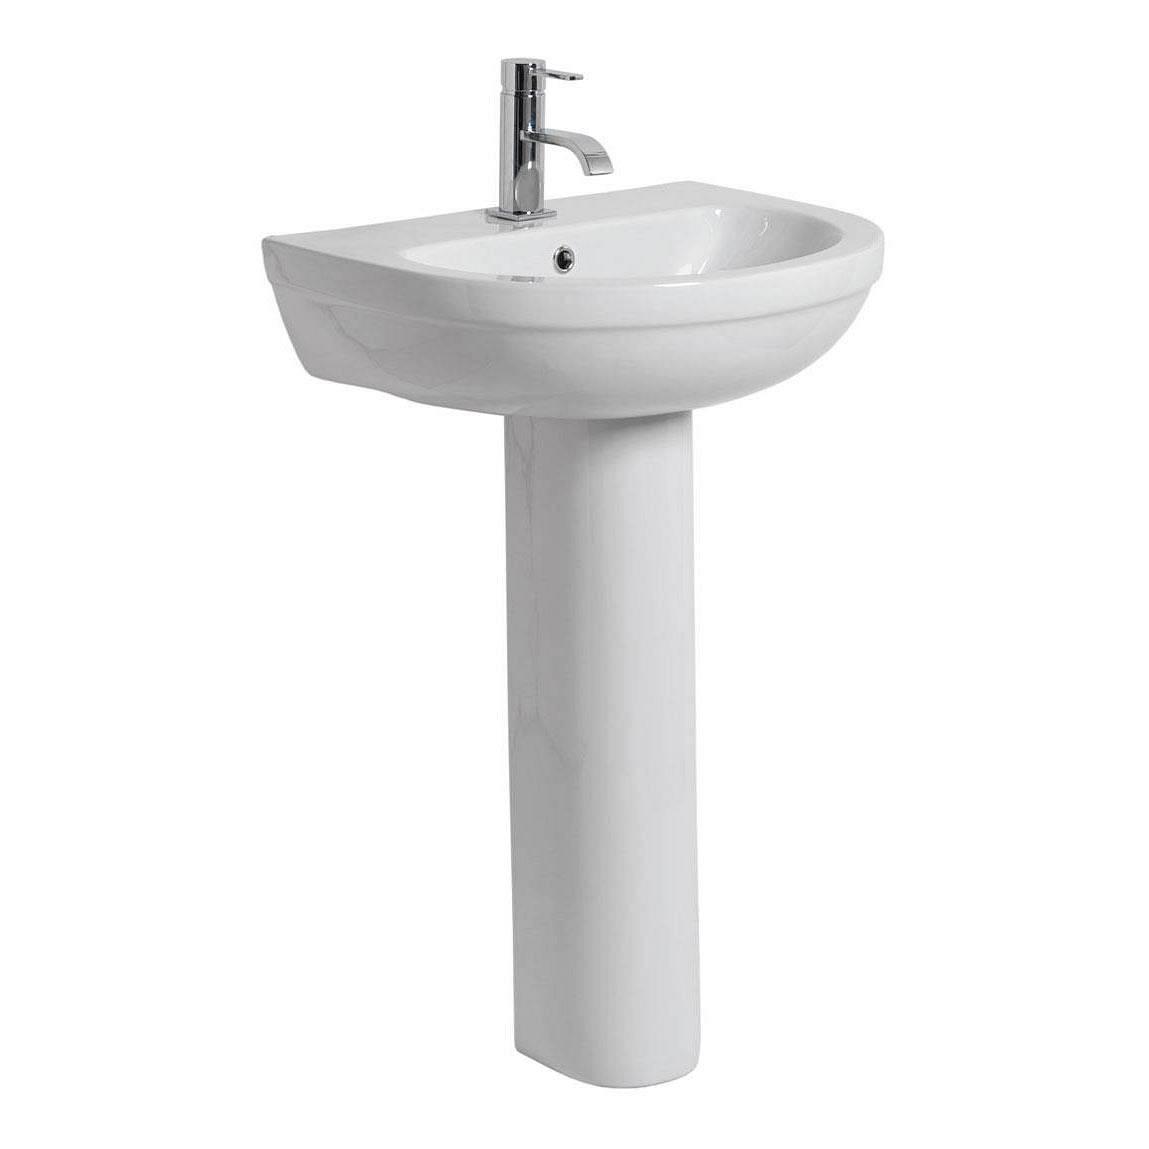 Image of Balance Basin & Pedestal